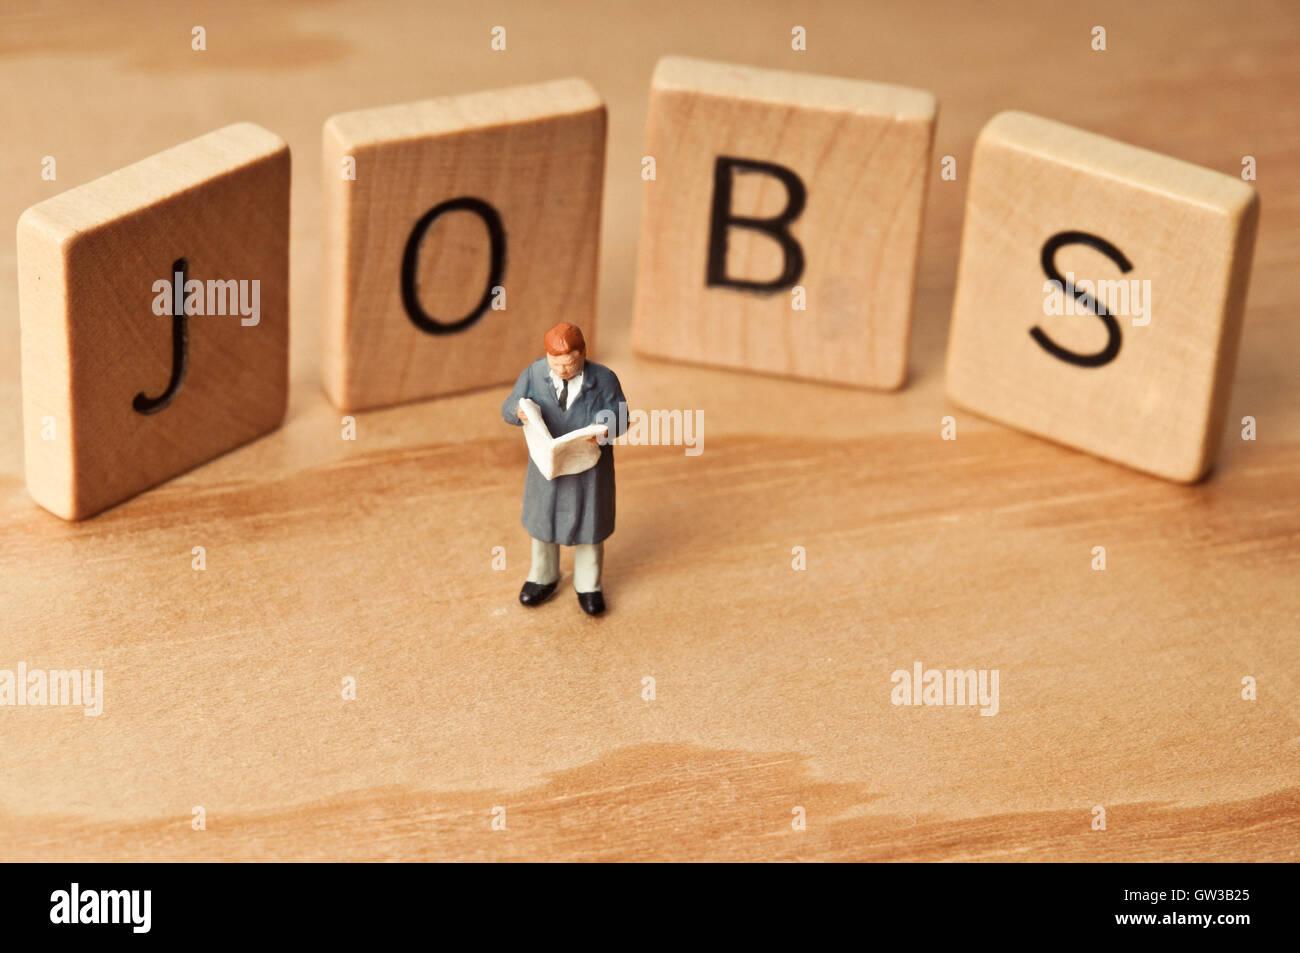 job seeking concept - Stock Image